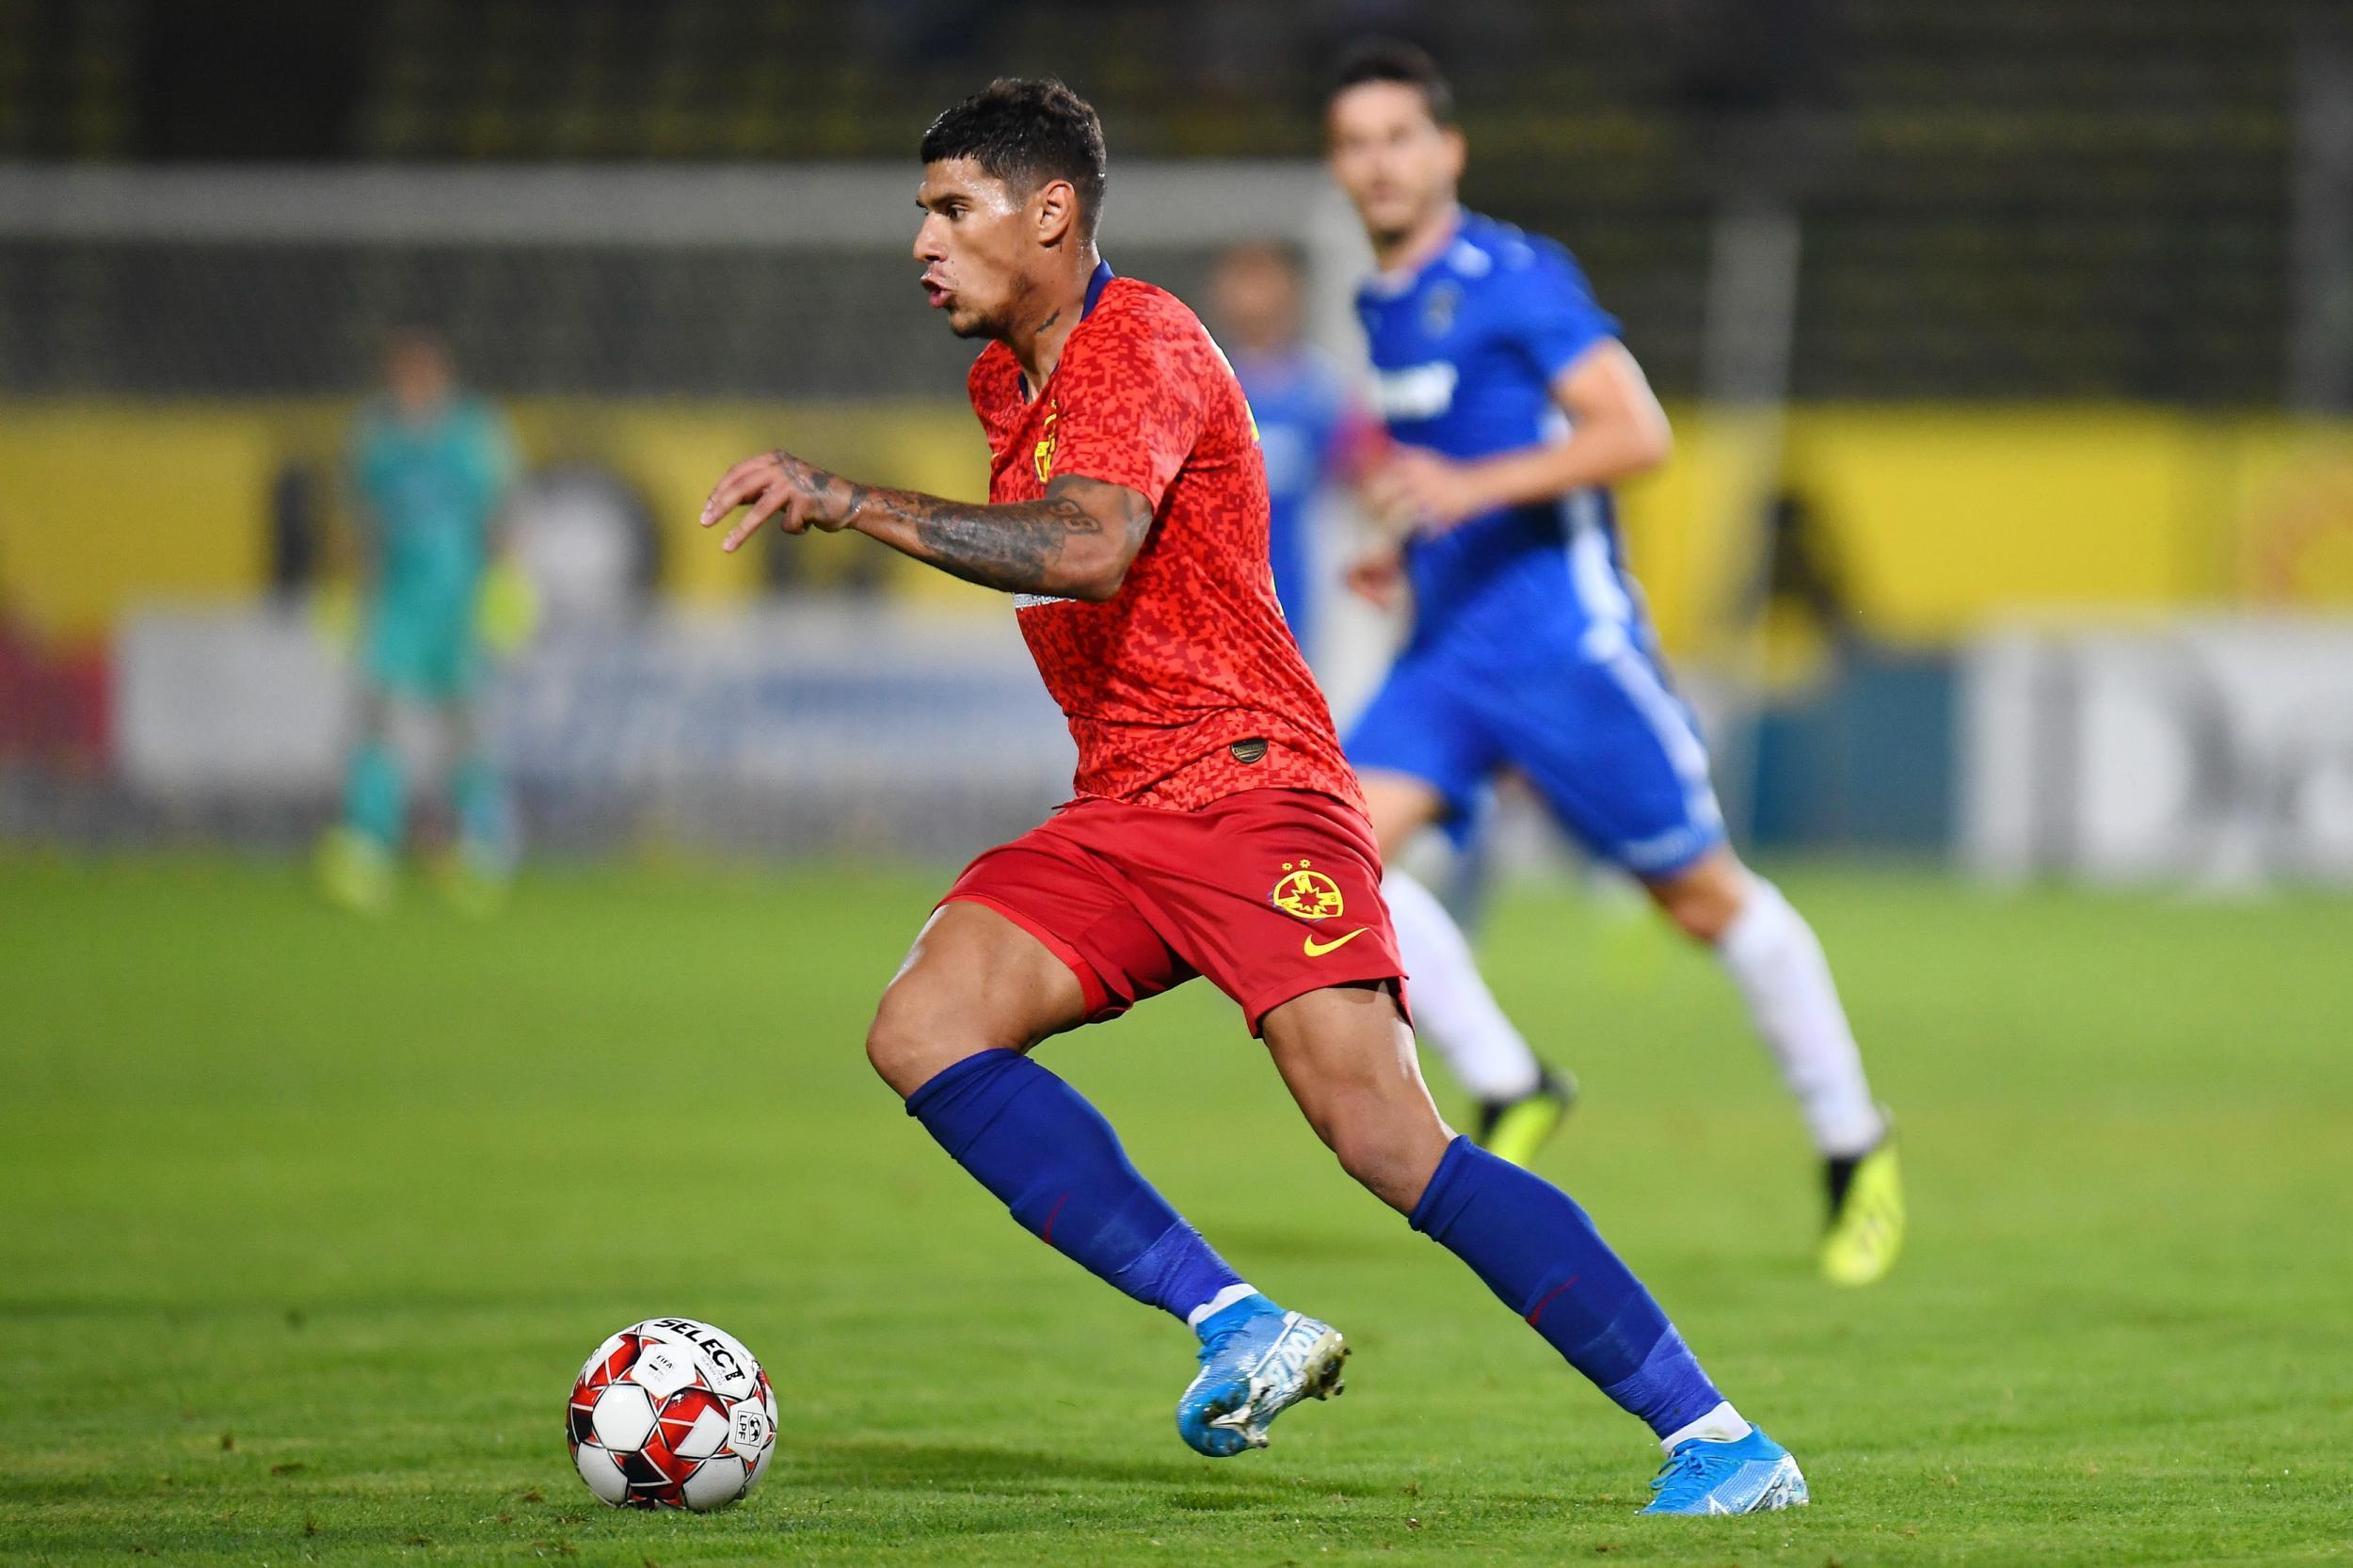 FCSB - FC VOLUNTARI 1-3